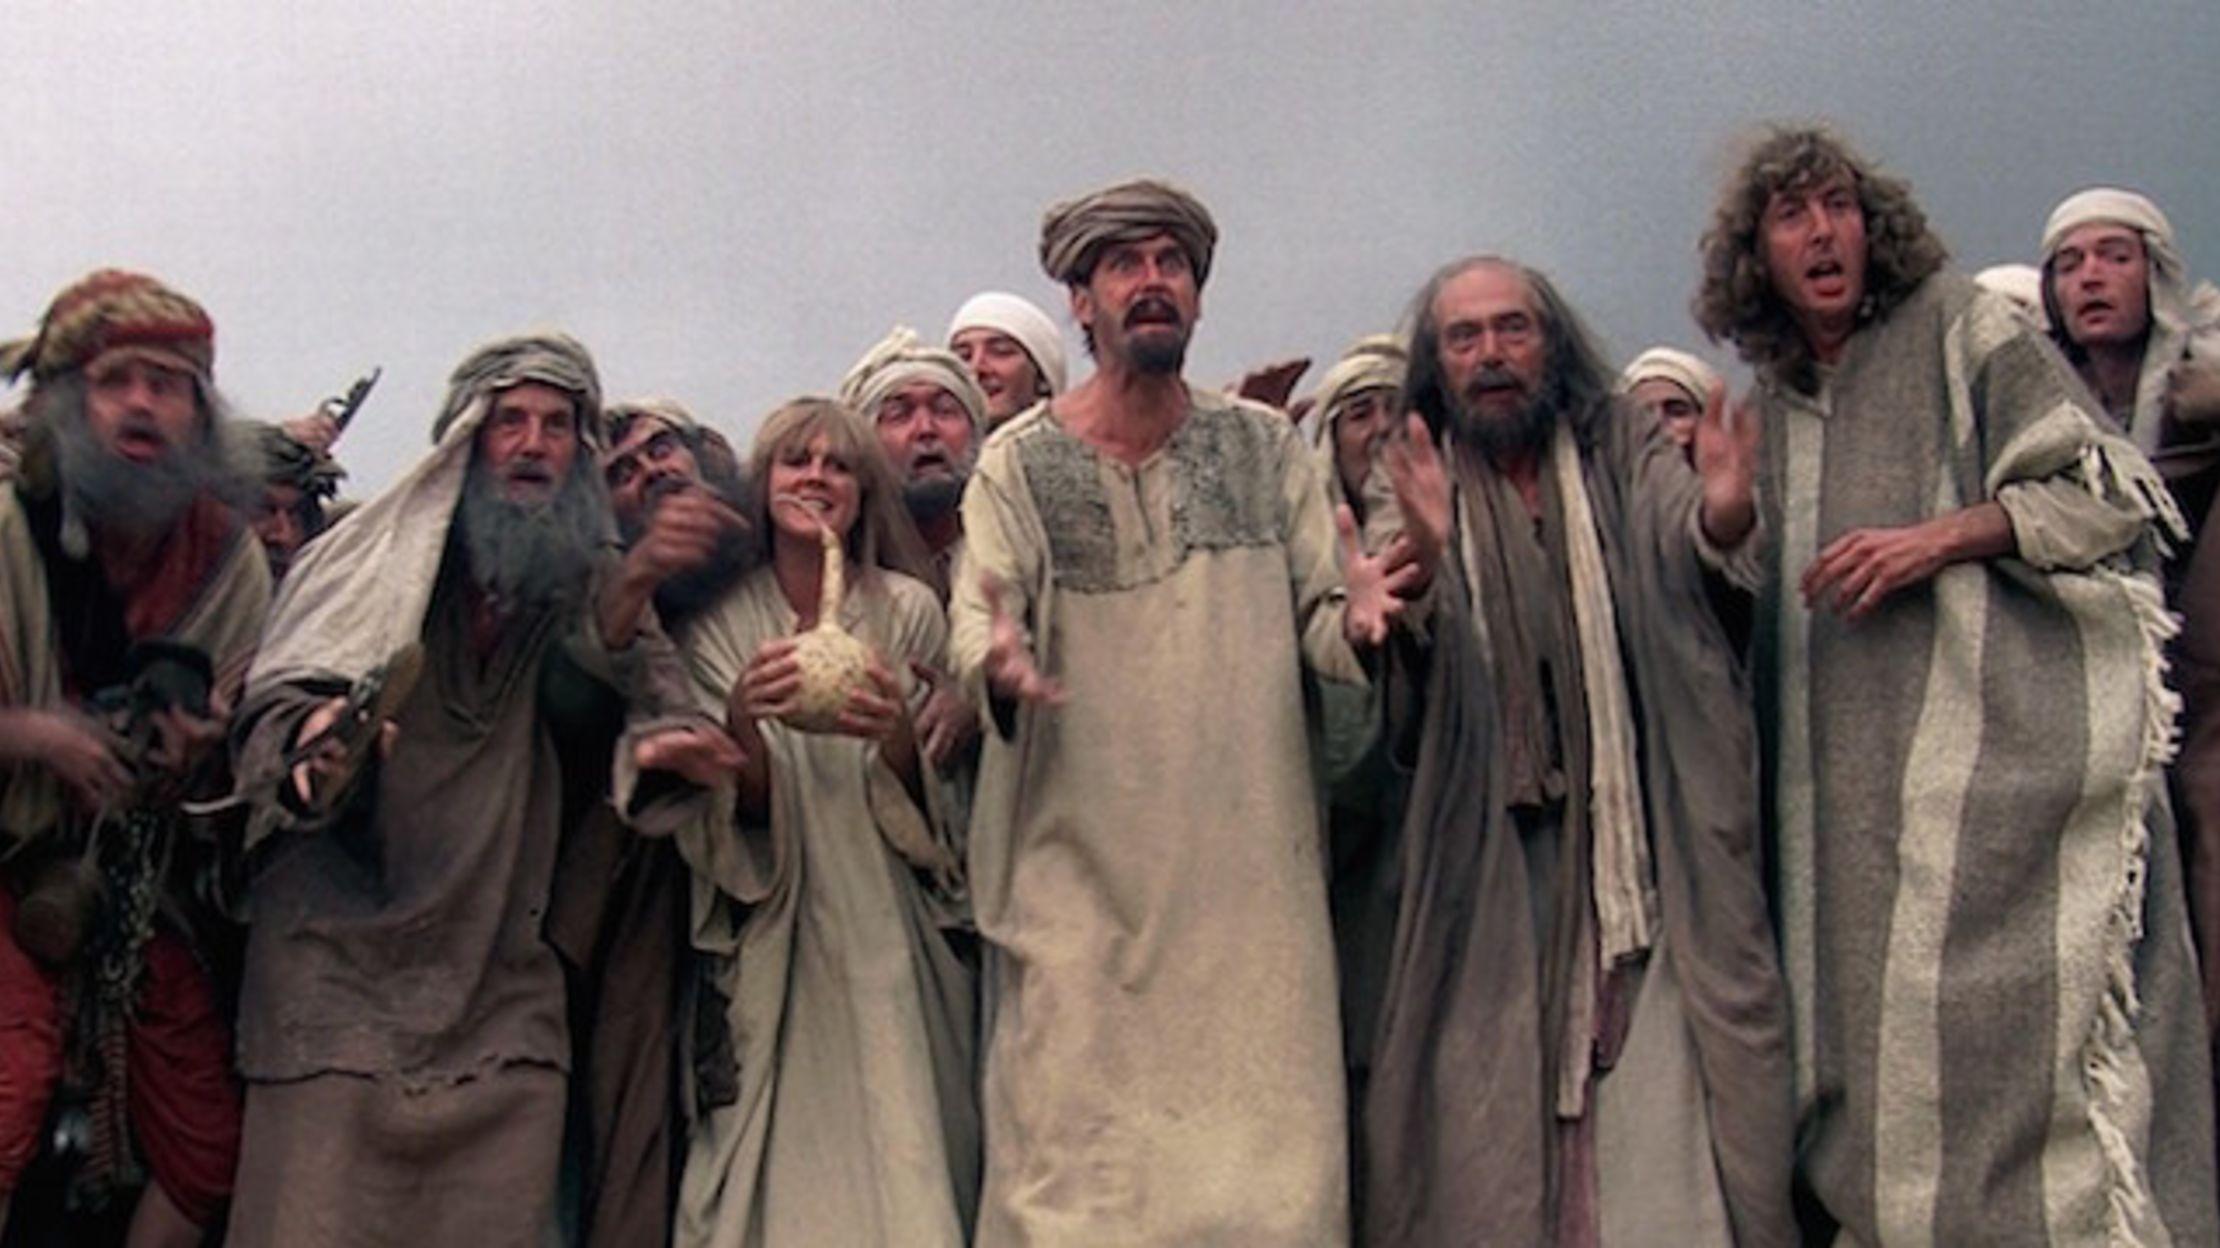 Monty Python's Life of Brian (1979) – Comedy